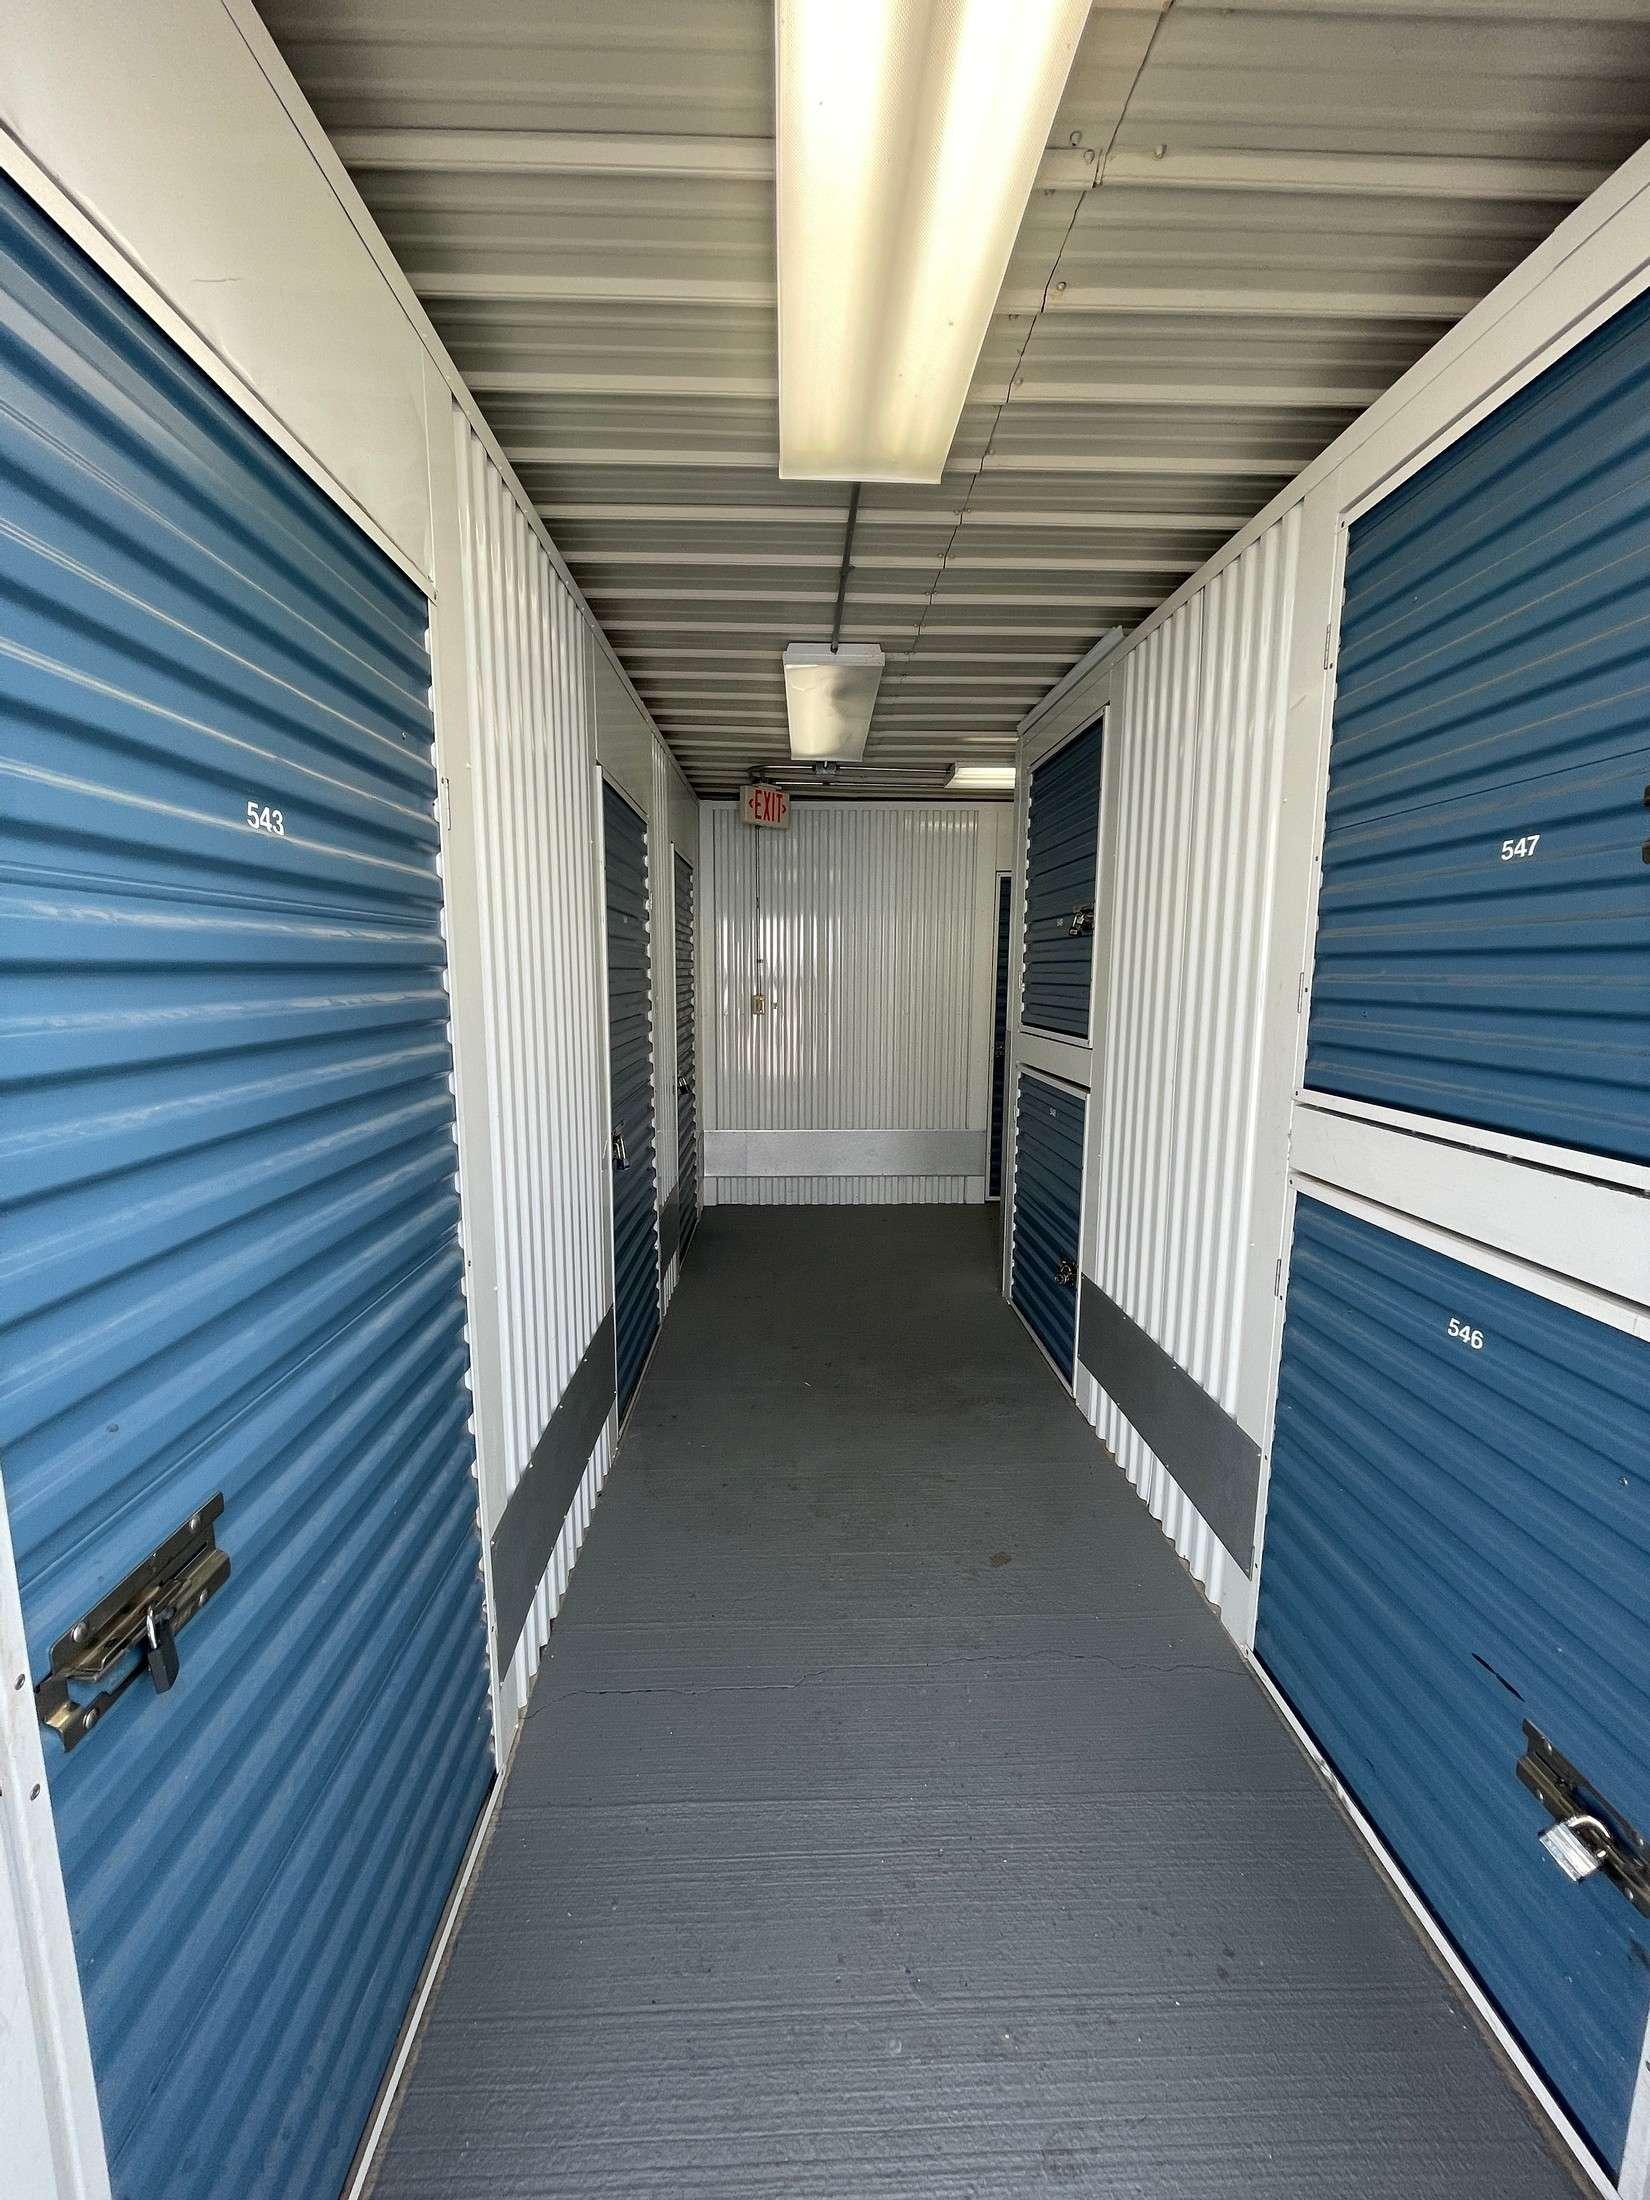 A1 U Store It Overland Interior corridor 543